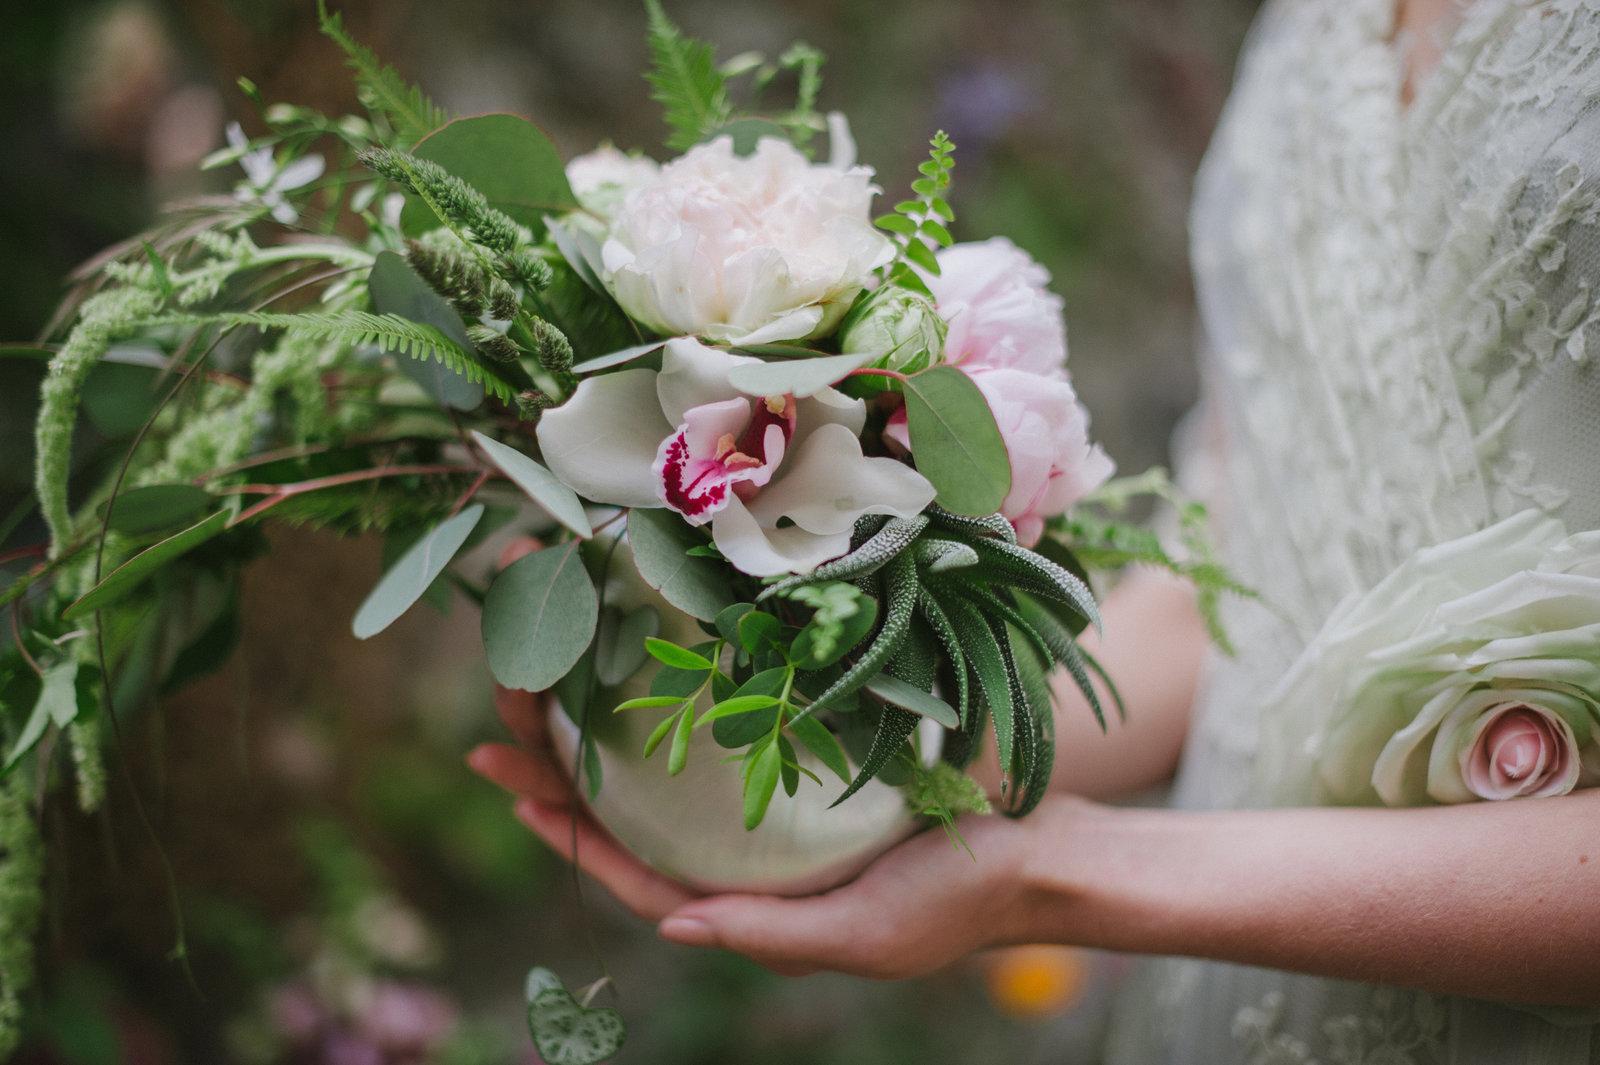 Langtry_pale_green_lace_edwardian_wedding_dress_JoanneFlemingDesign (6)